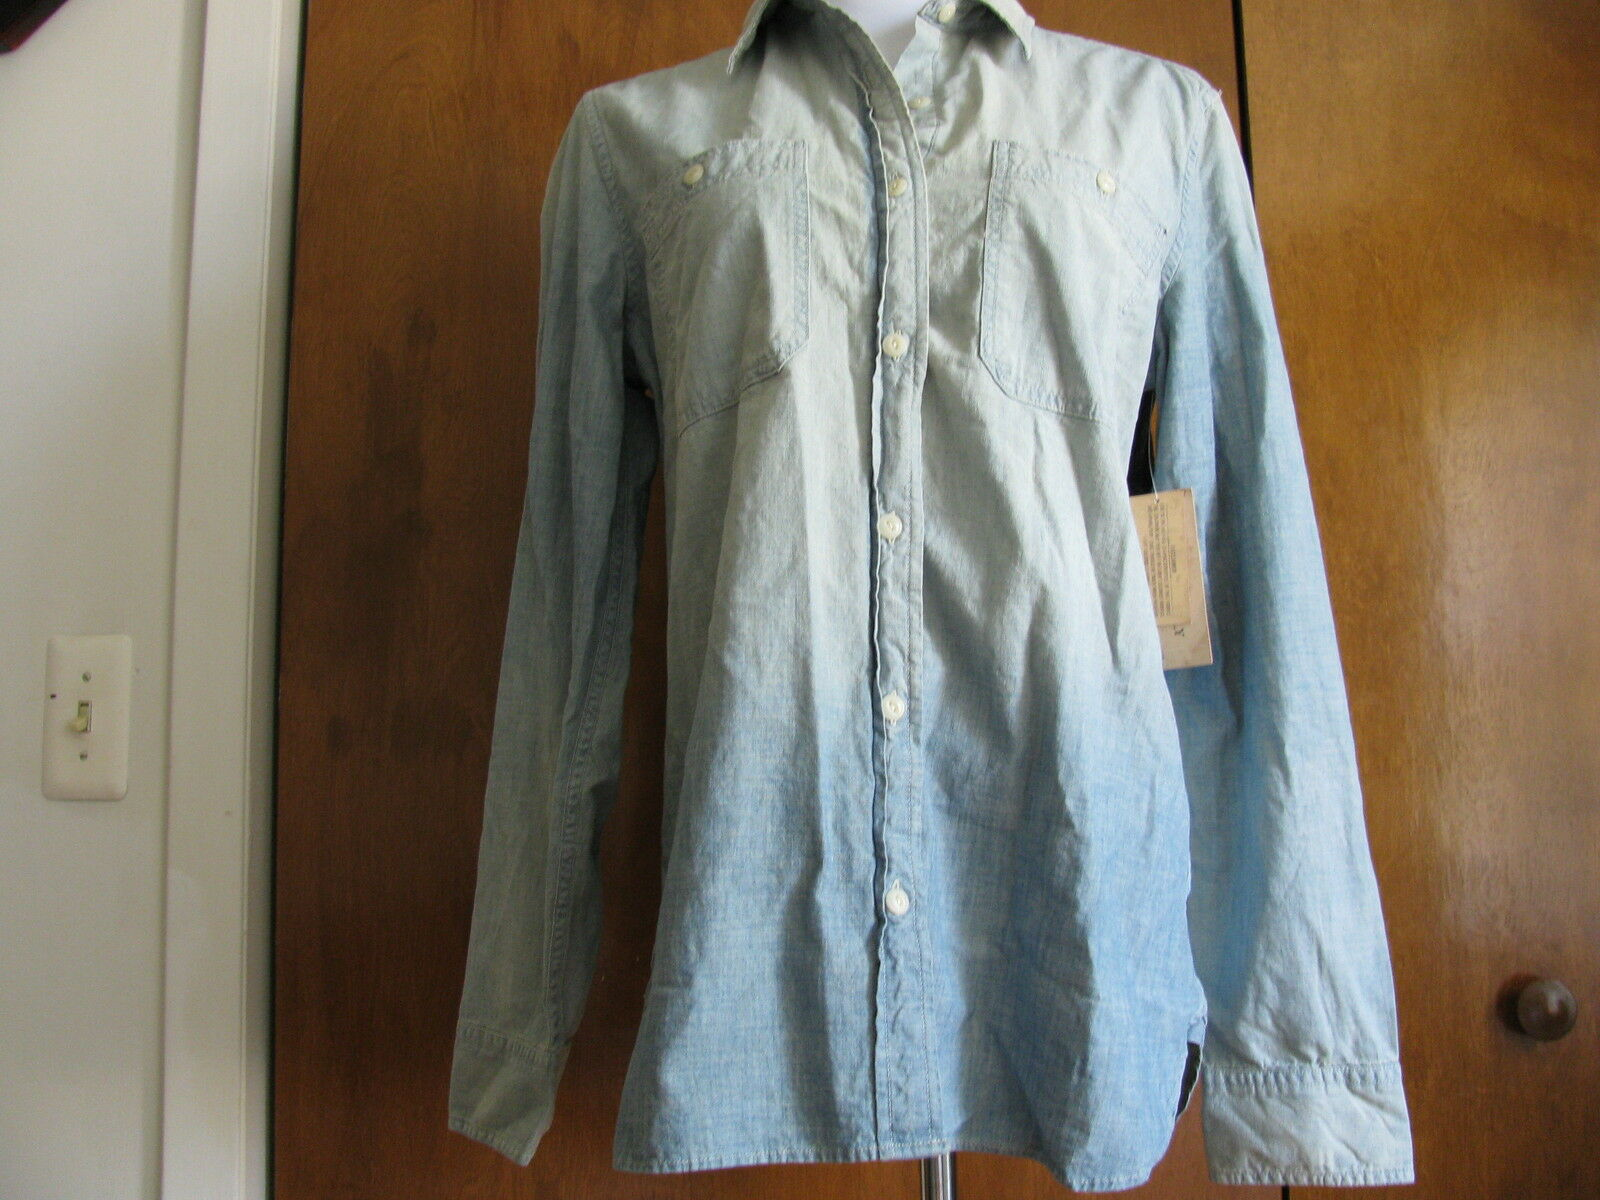 Ralph Laure Denim & Supply women's jean shirt size Medium NWT